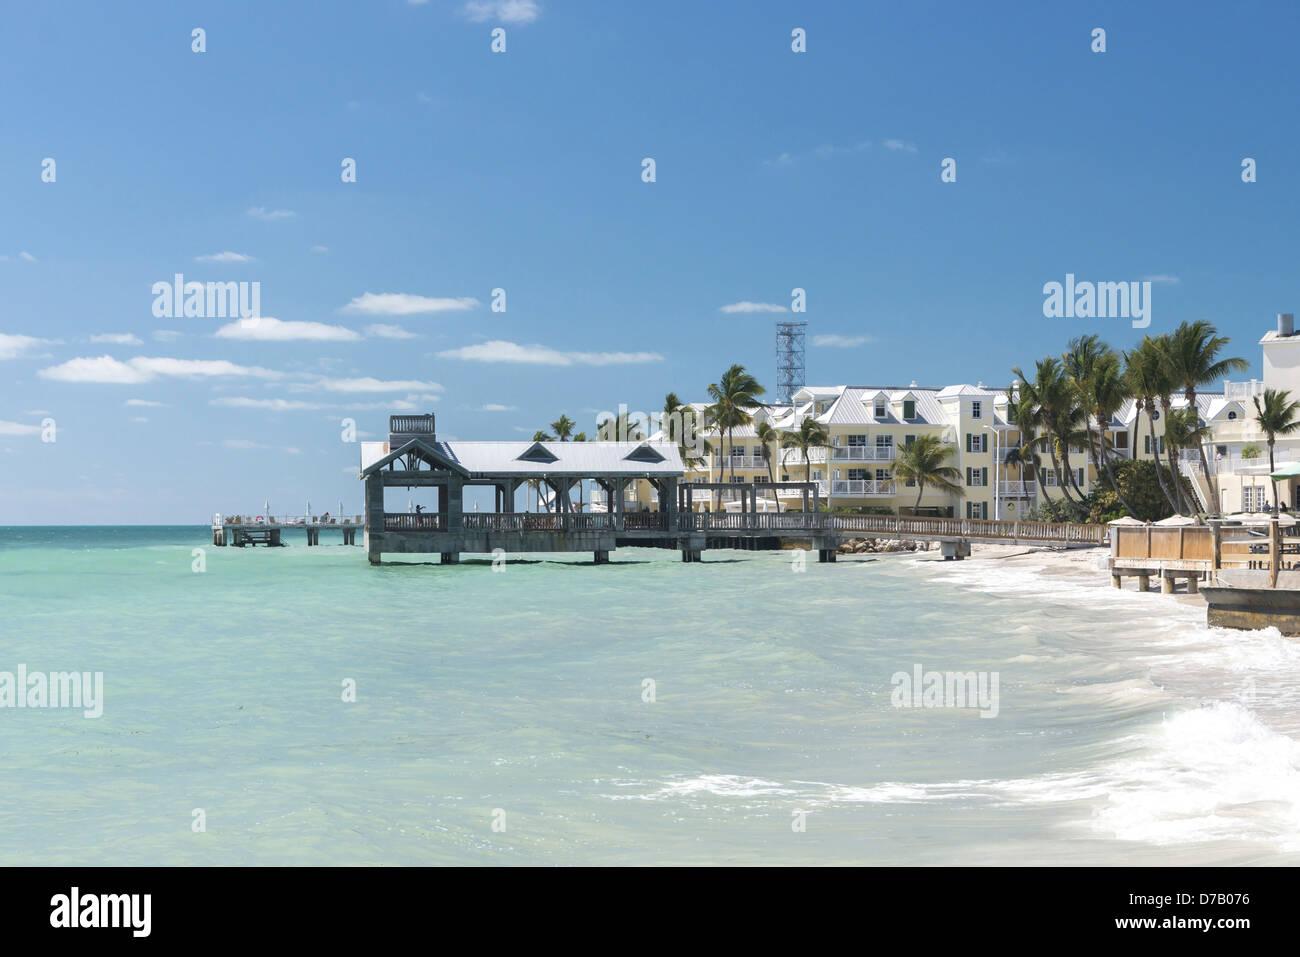 South Beach, Key West, Florida, USA - Stock Image